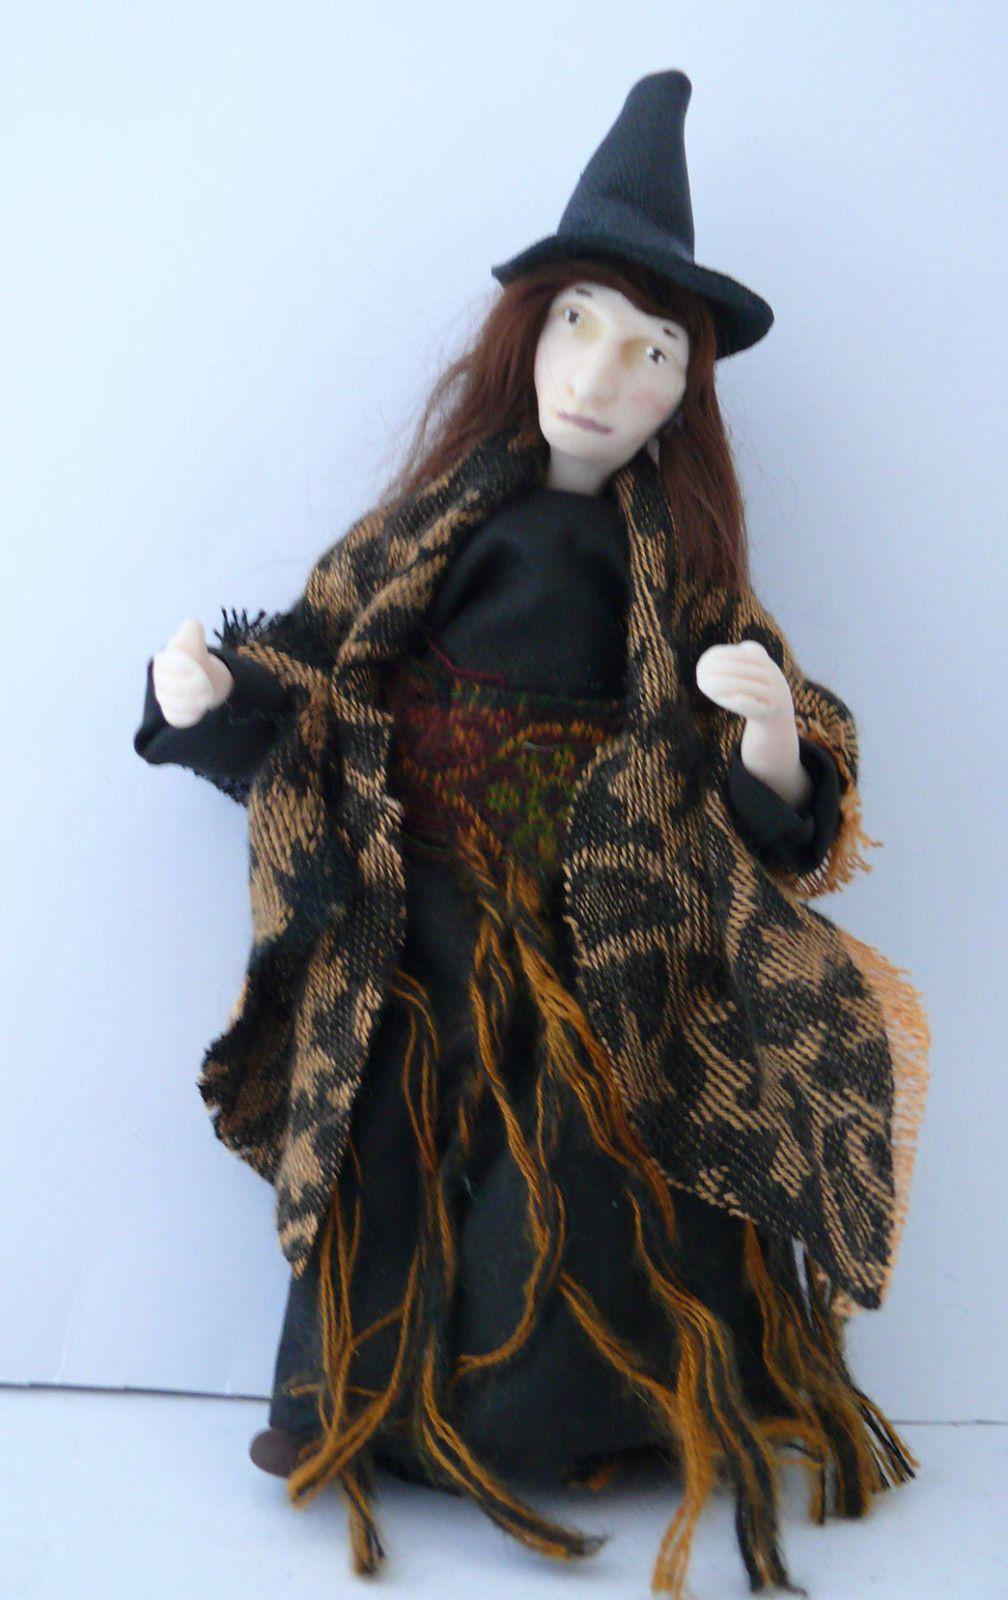 Artisan Dolls House Polymer Clay Witch/ Hag  Ooak Figure 1:12th in glass display Puppenstuben & -häuser